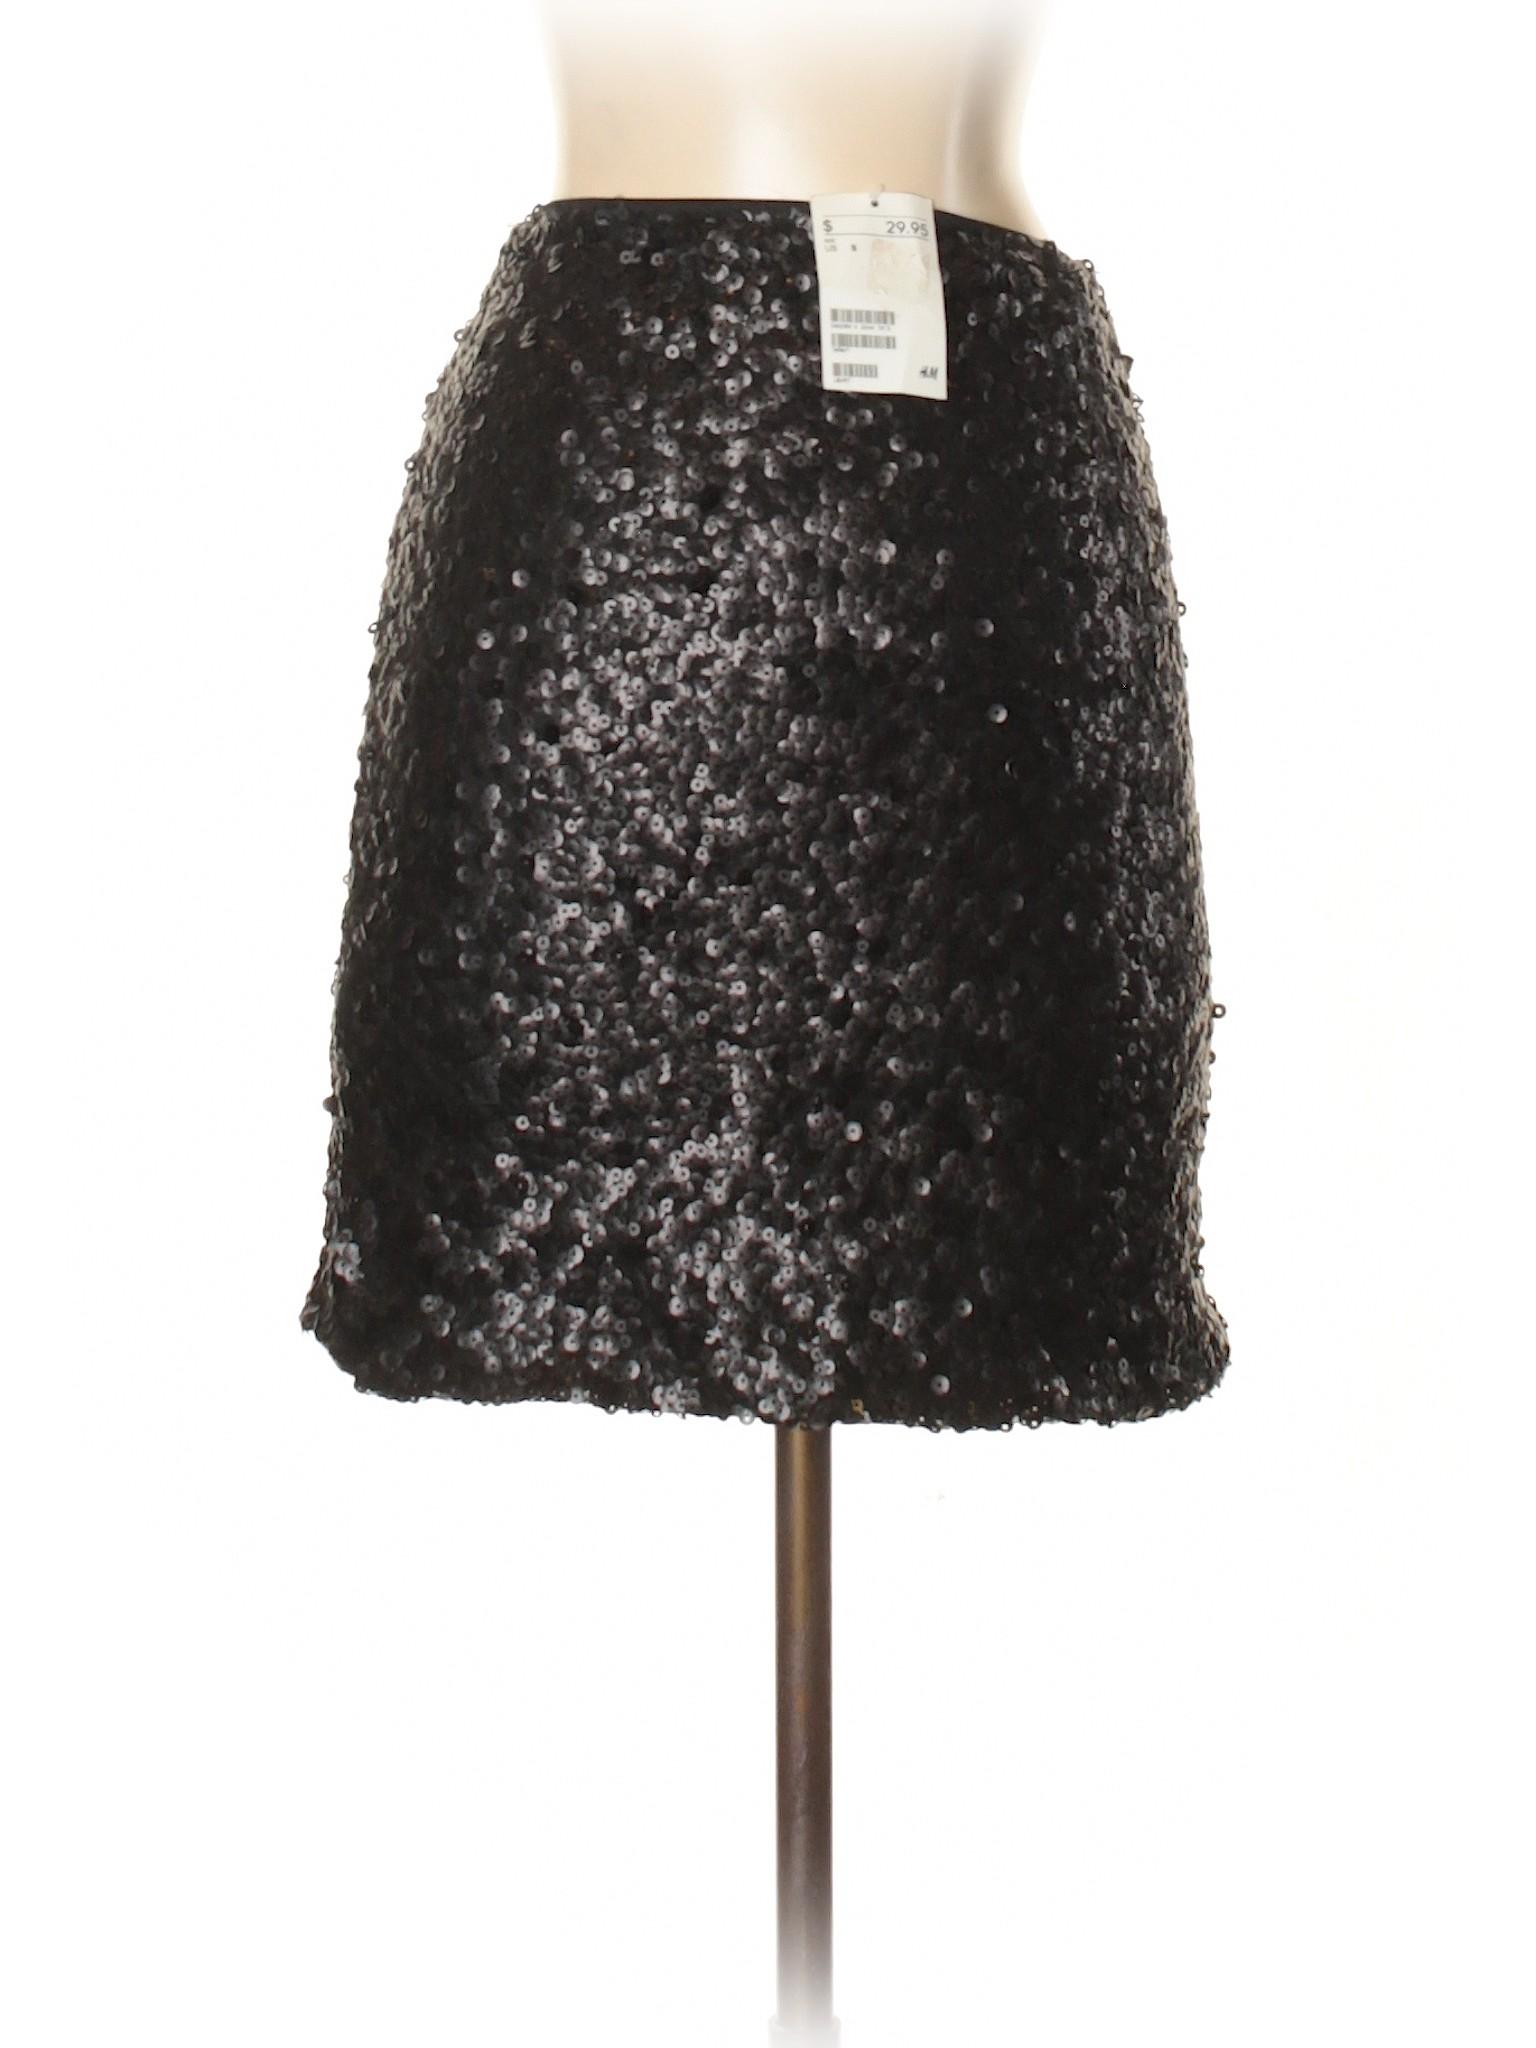 Skirt Boutique Casual Boutique Skirt Casual Boutique Skirt Boutique Skirt Boutique Casual Skirt Casual Casual Boutique Casual Skirt dxwvdf